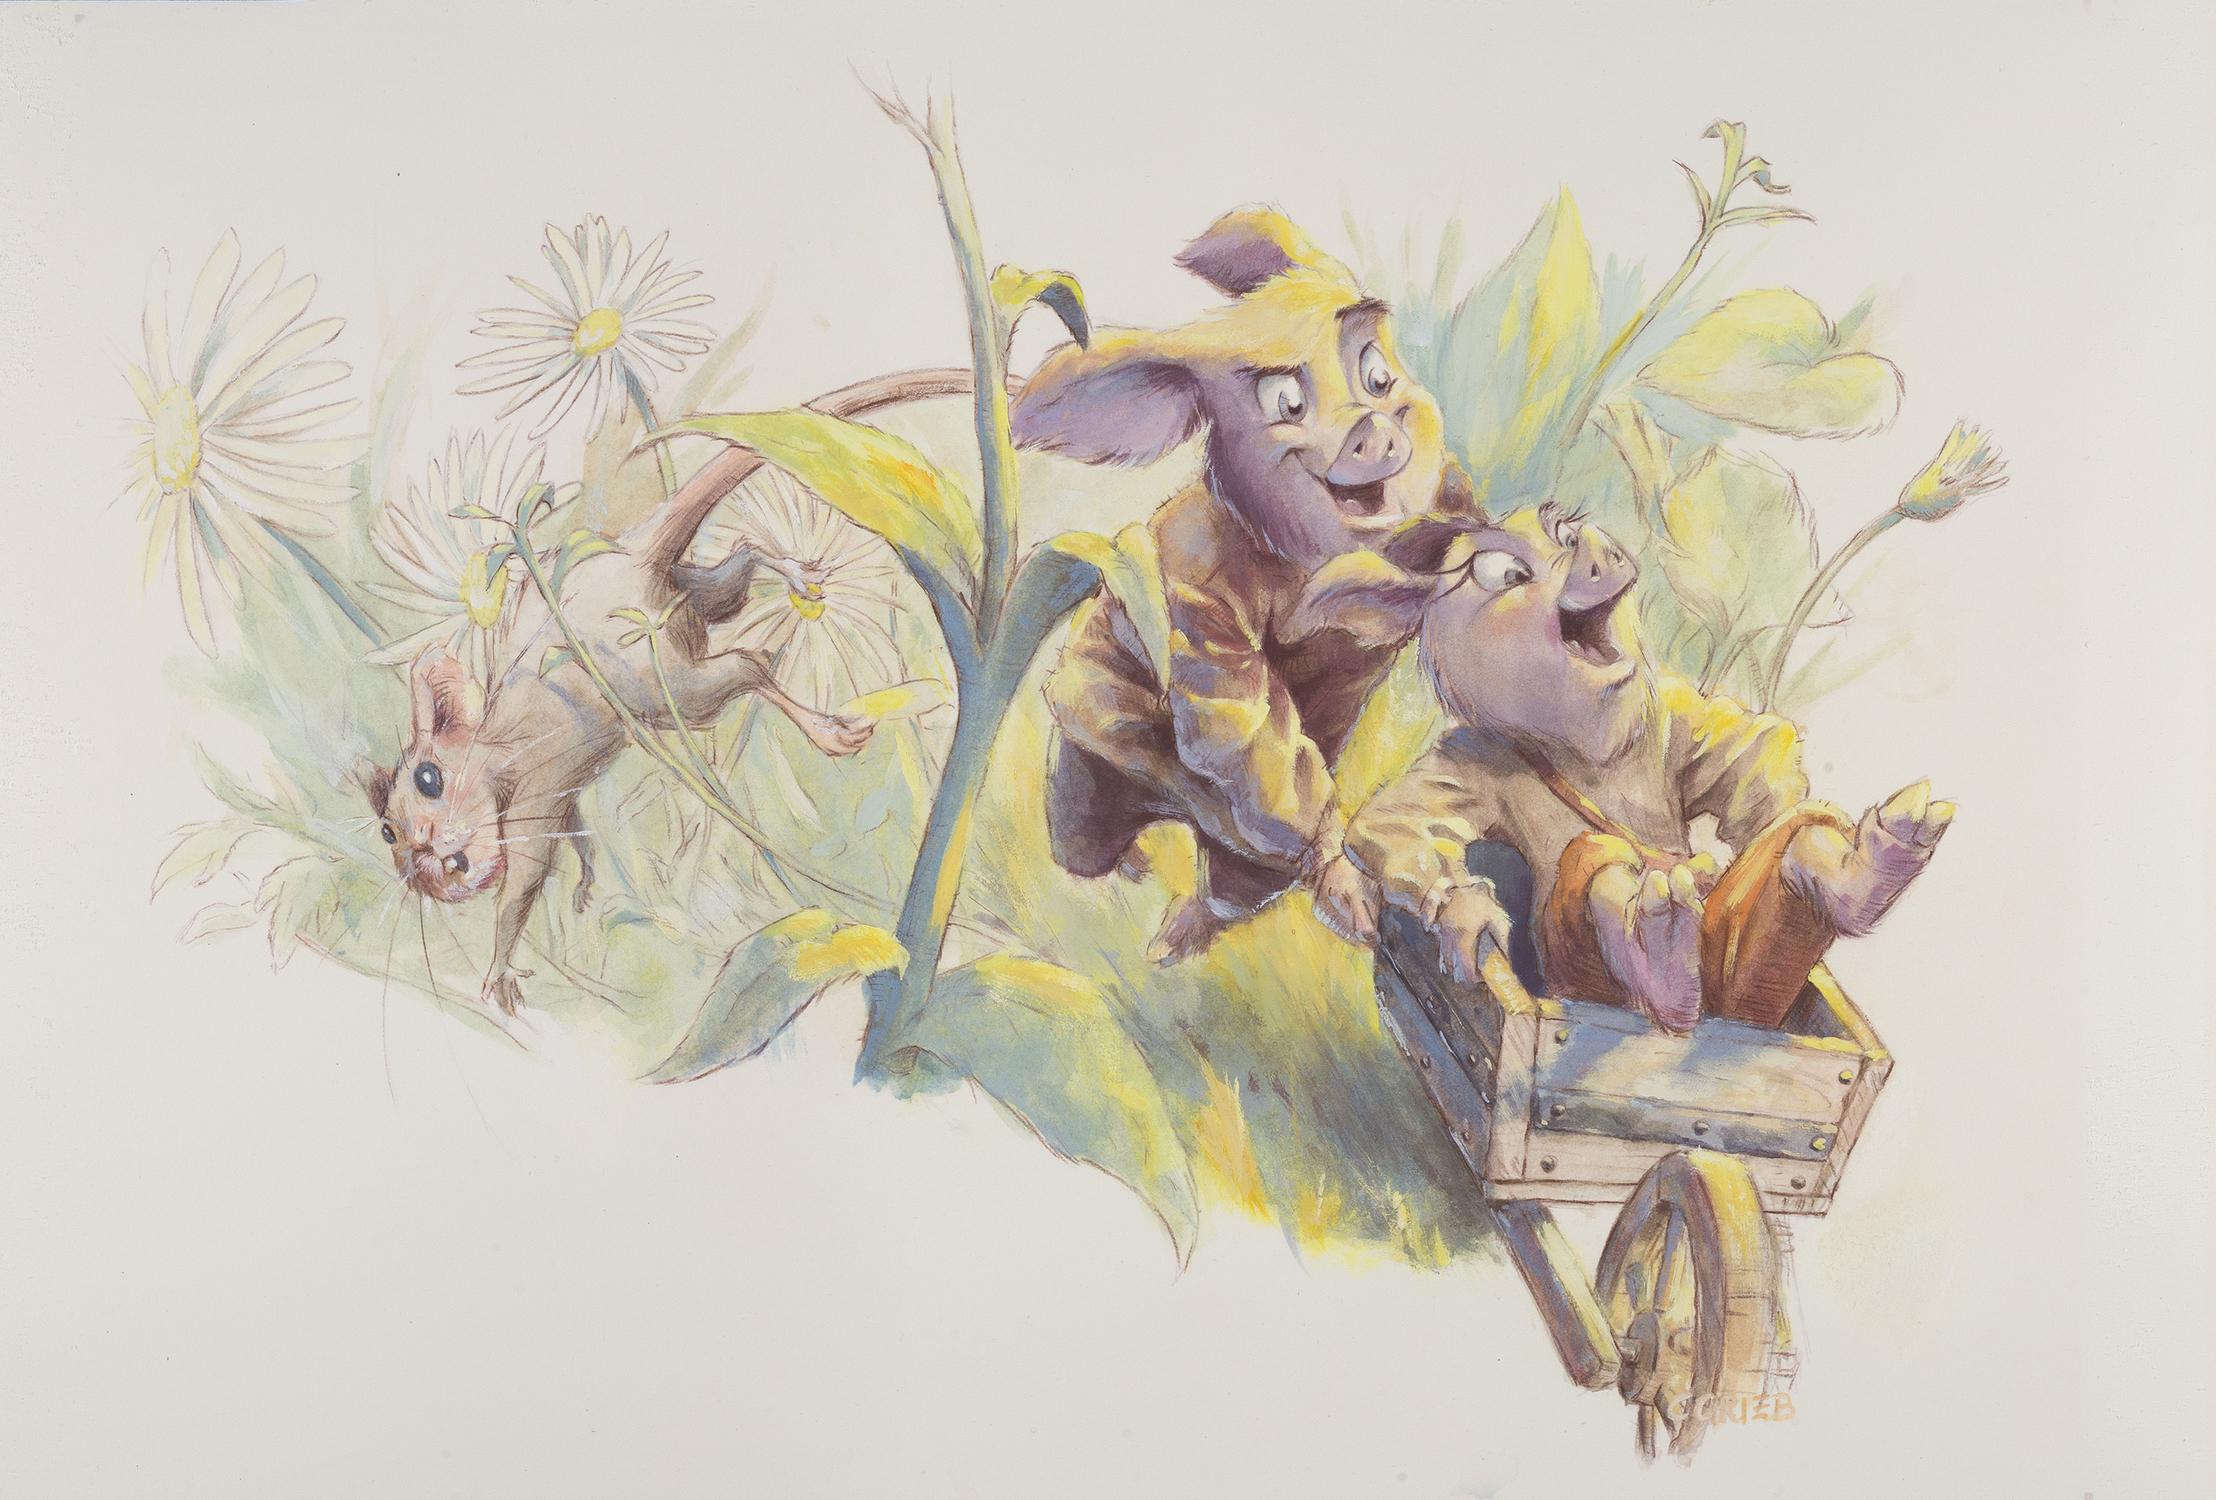 Riding in the Wheelbarrow Artwork by Chuck Grieb